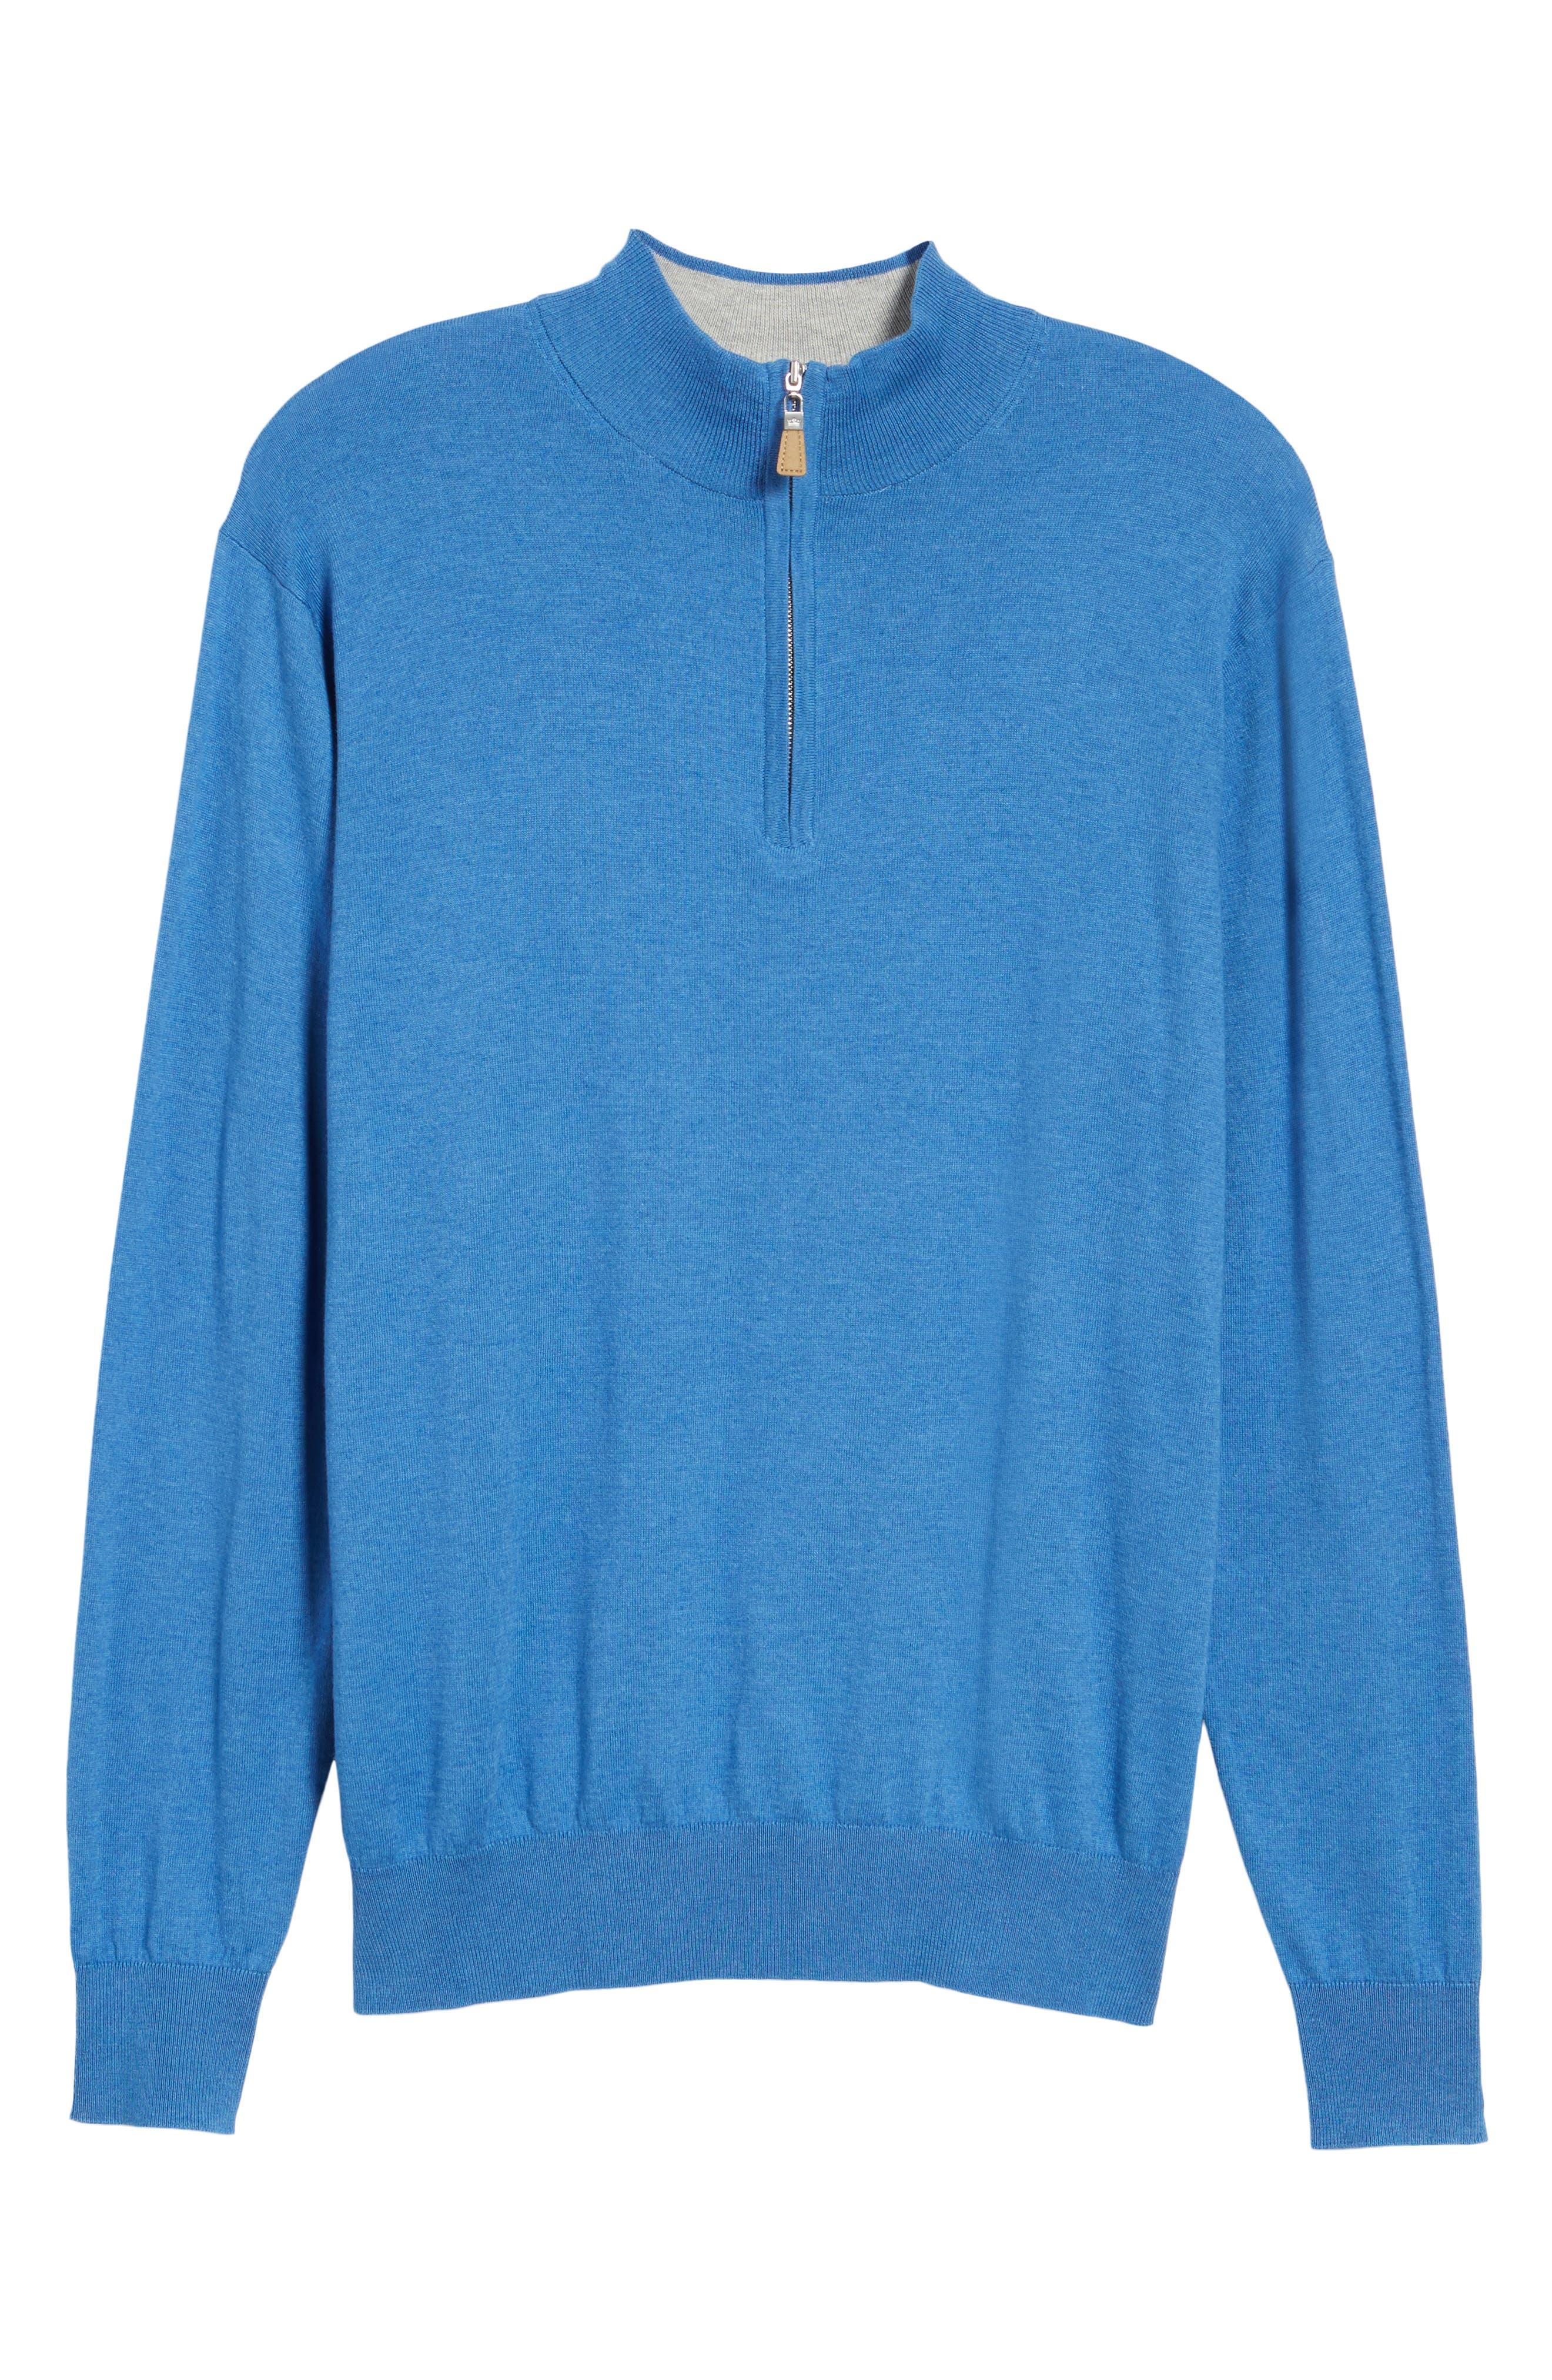 Crown Soft Quarter-Zip Pullover,                             Alternate thumbnail 6, color,                             Boardwalk Blue